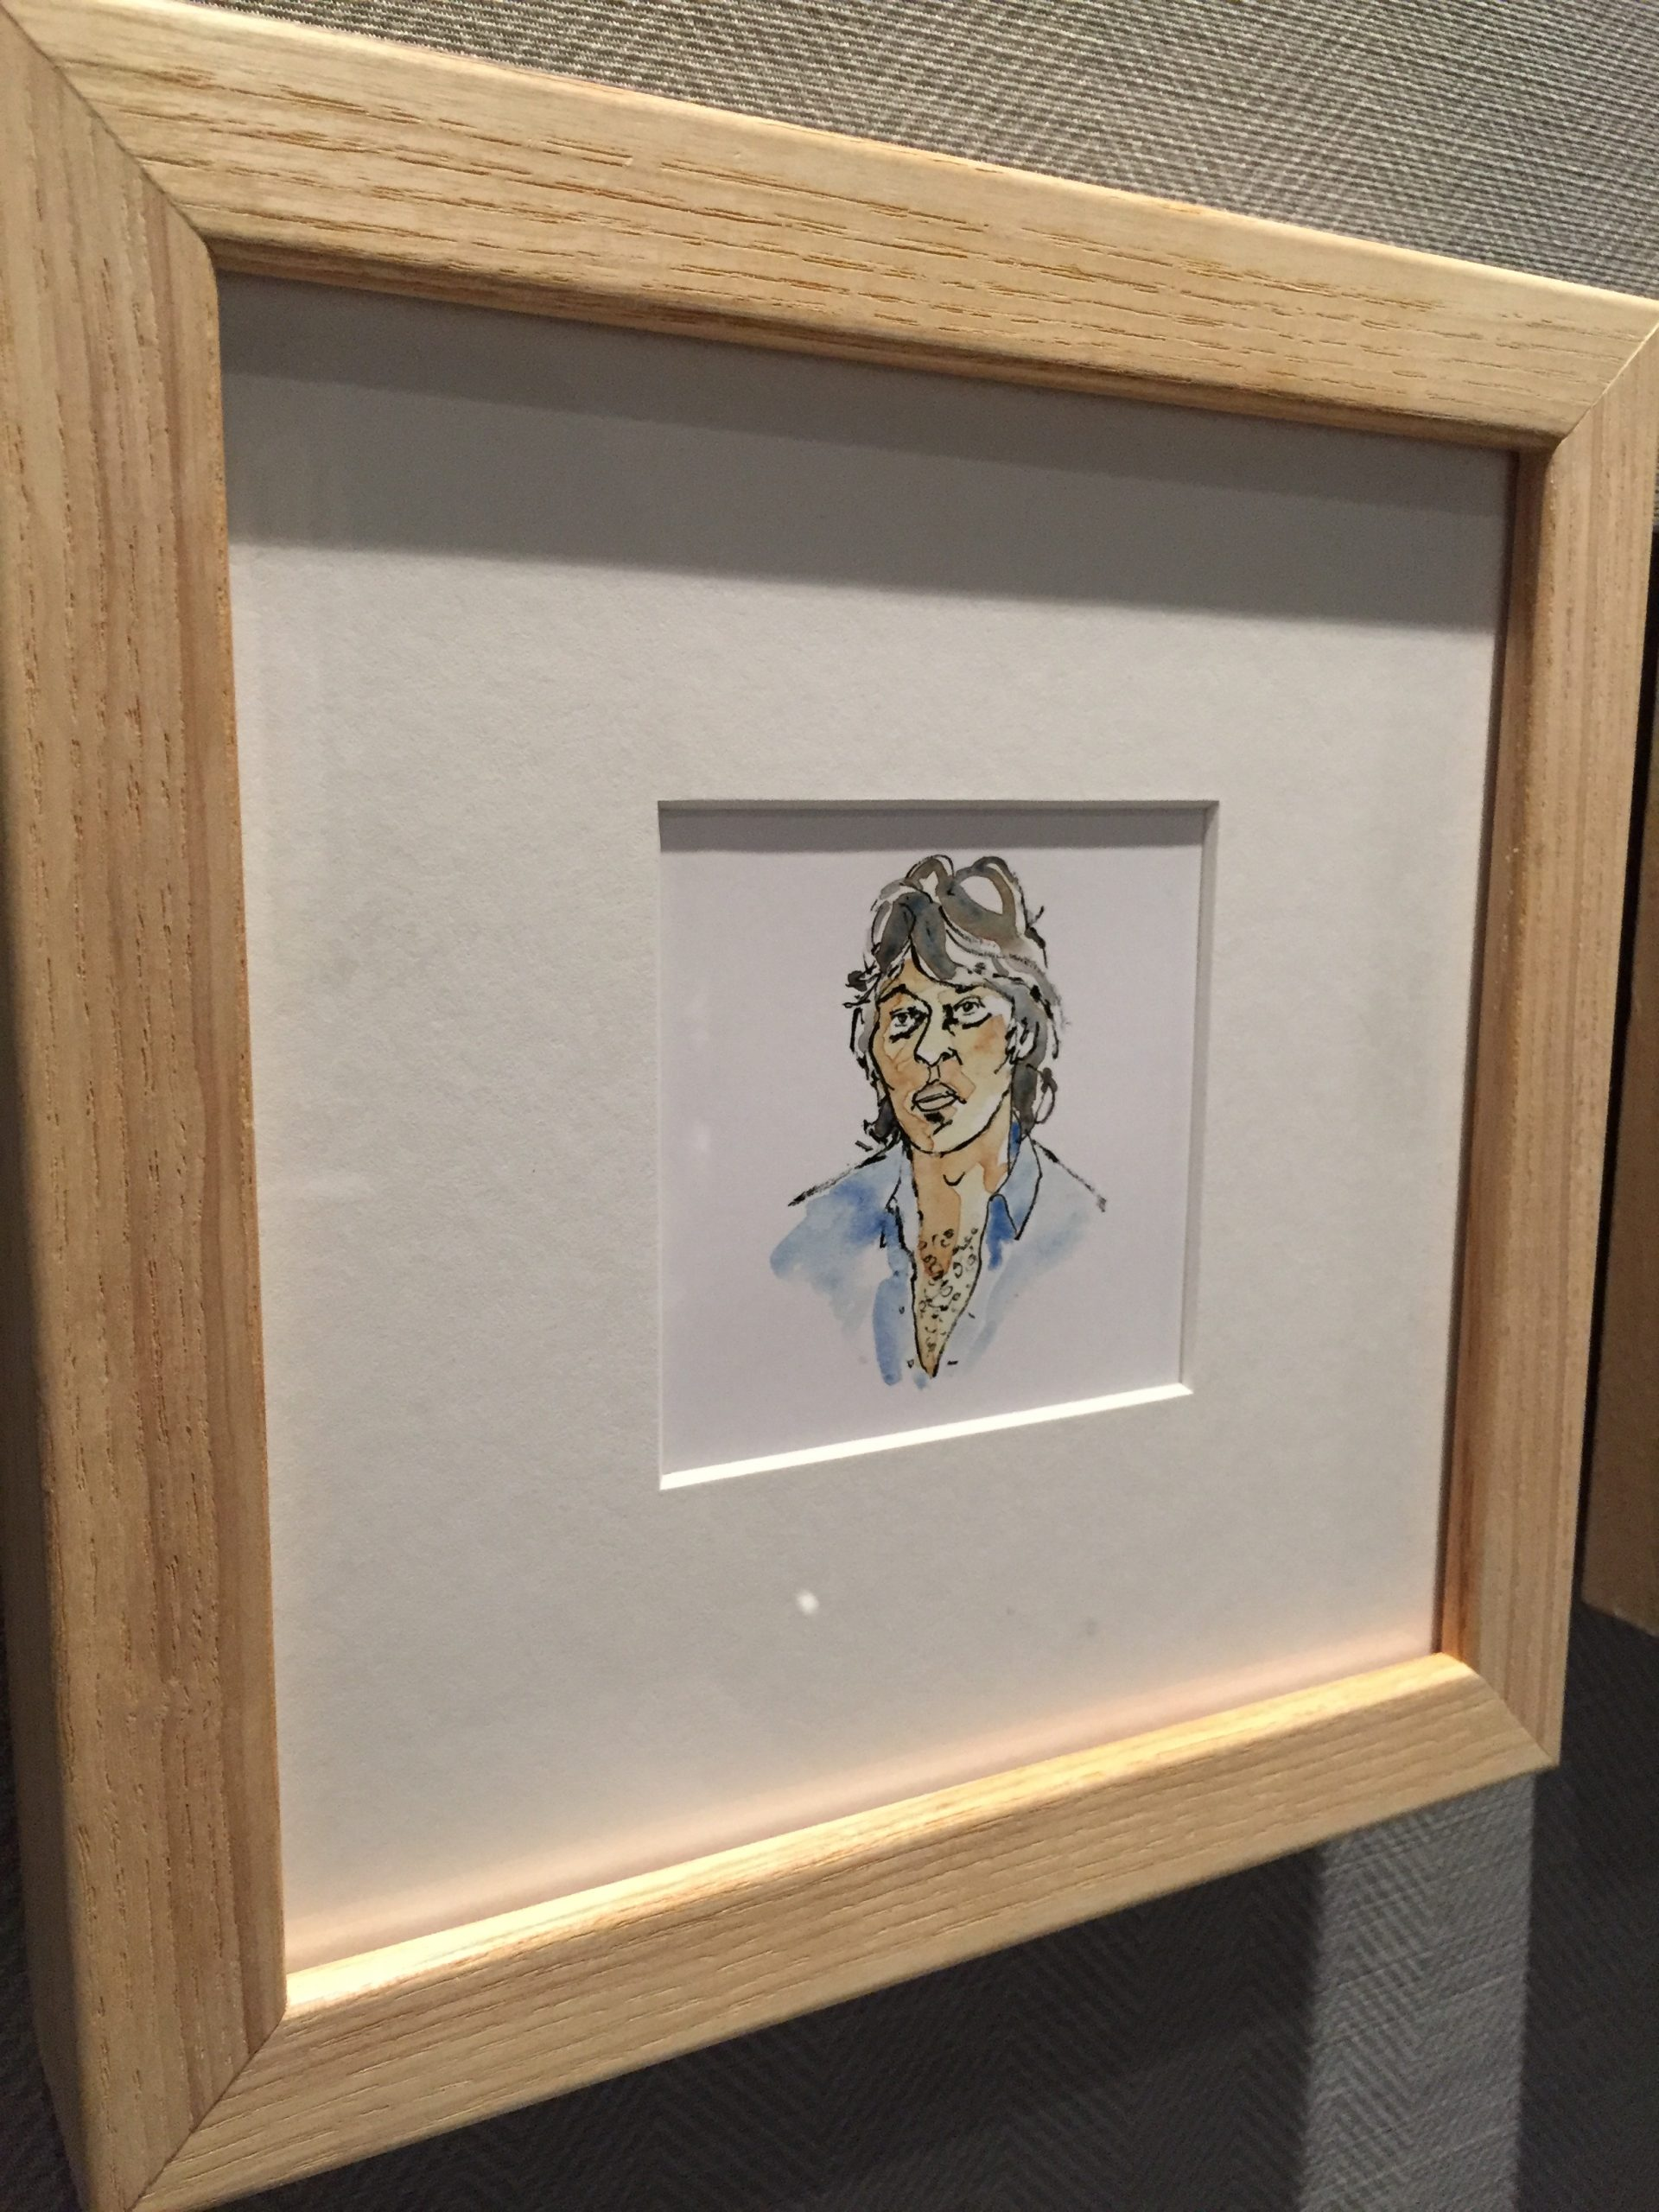 Watercolour portrait of Robbie Robertson by Alison Garwood-Jones